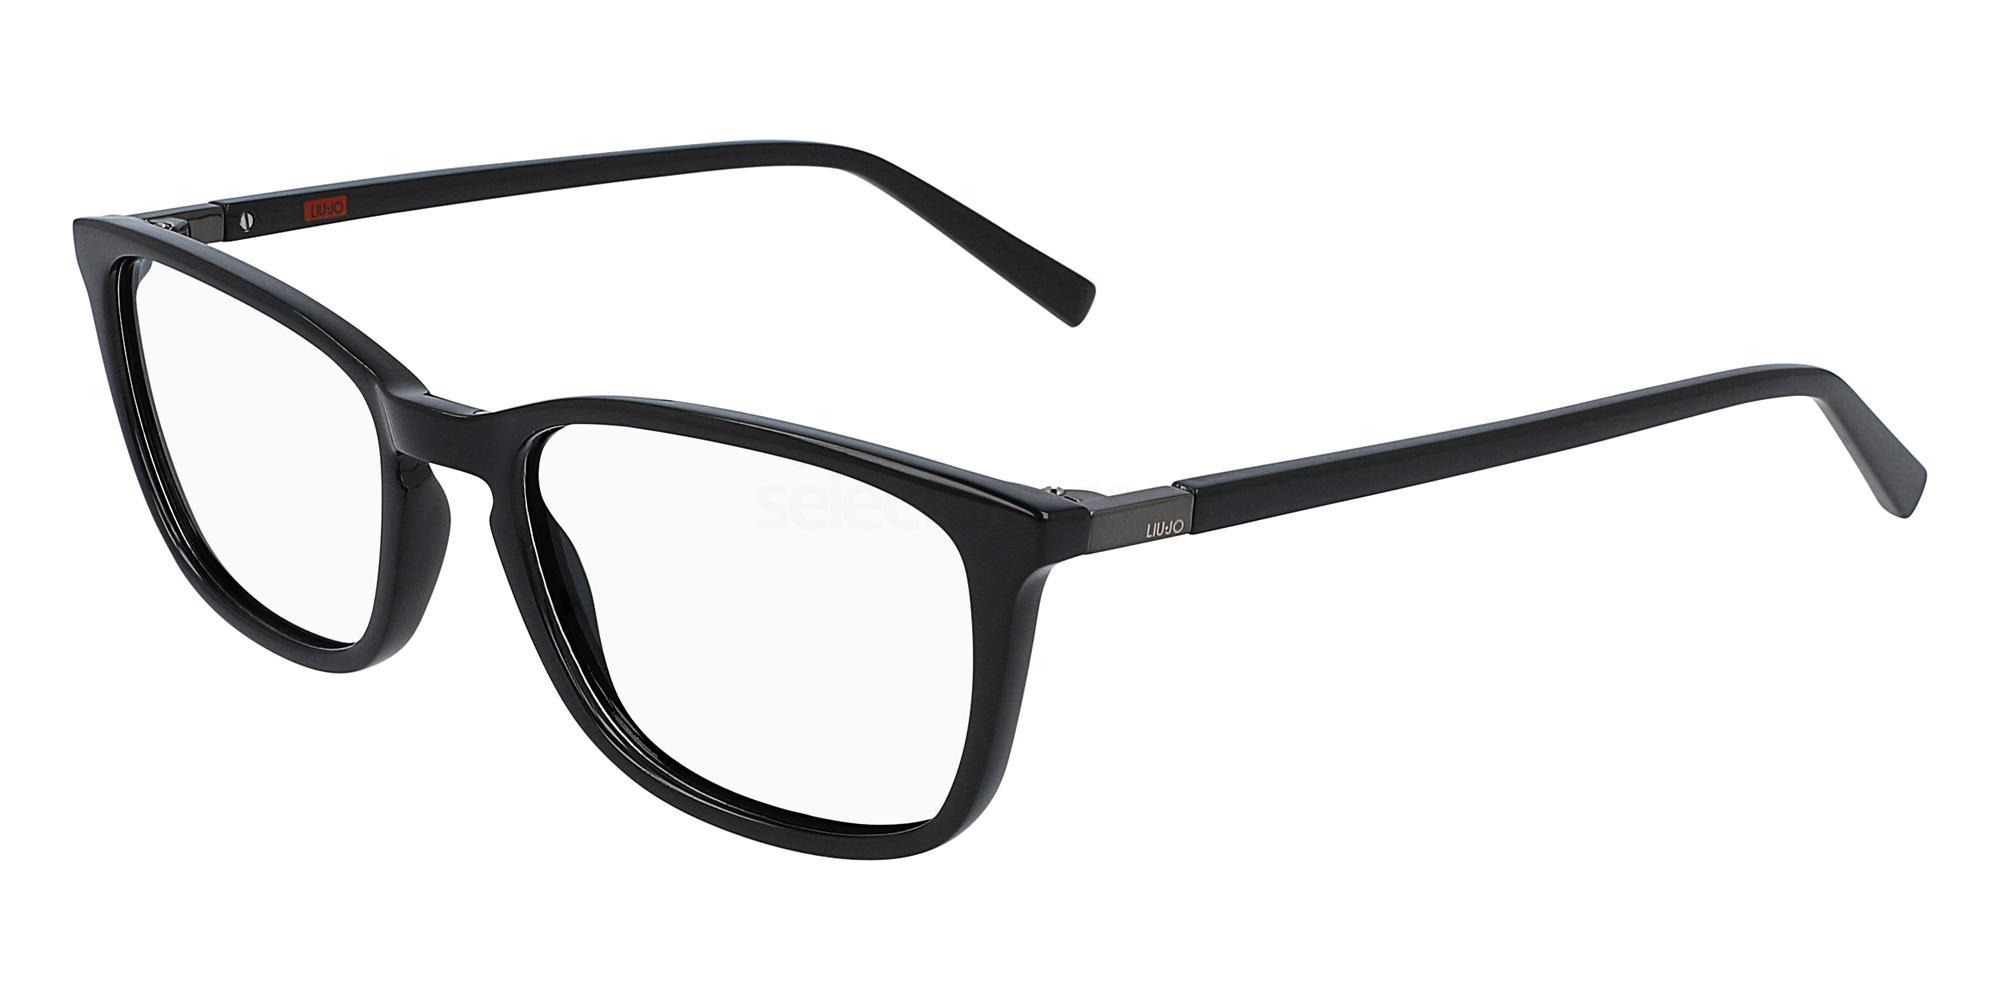 001 LJ2718 Glasses, Liu Jo